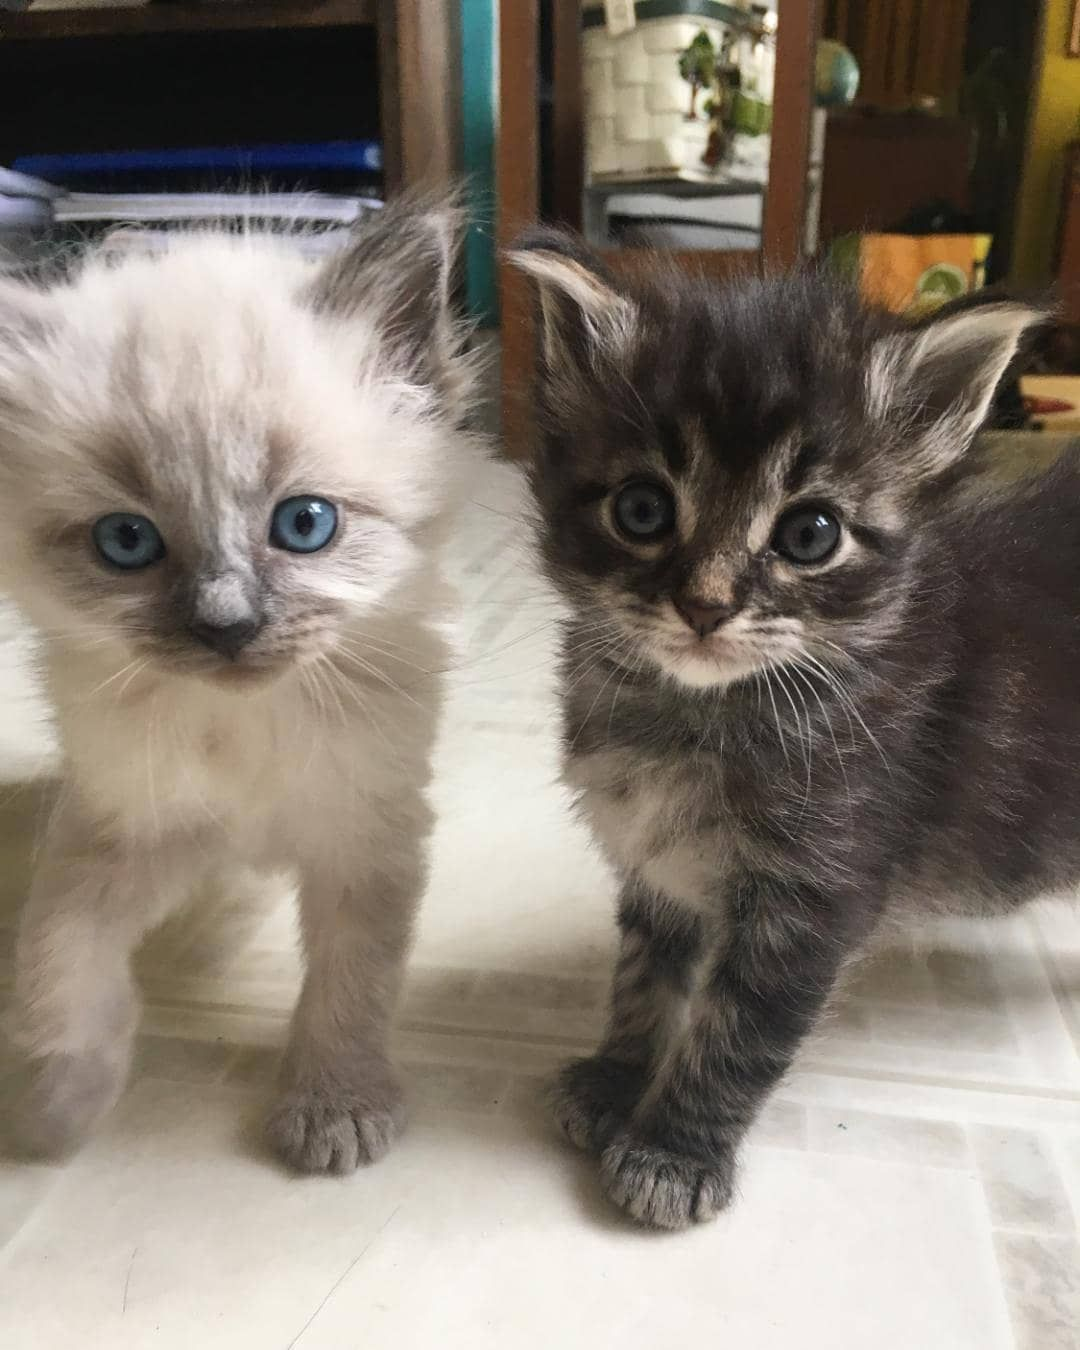 Kittens Cat Kitten Cats Kittens Lit Cute Fluff Small Adorable Love Hold Tiny Blue Kittens Cat Kitten Cats K Kittens Cats And Kittens Cats